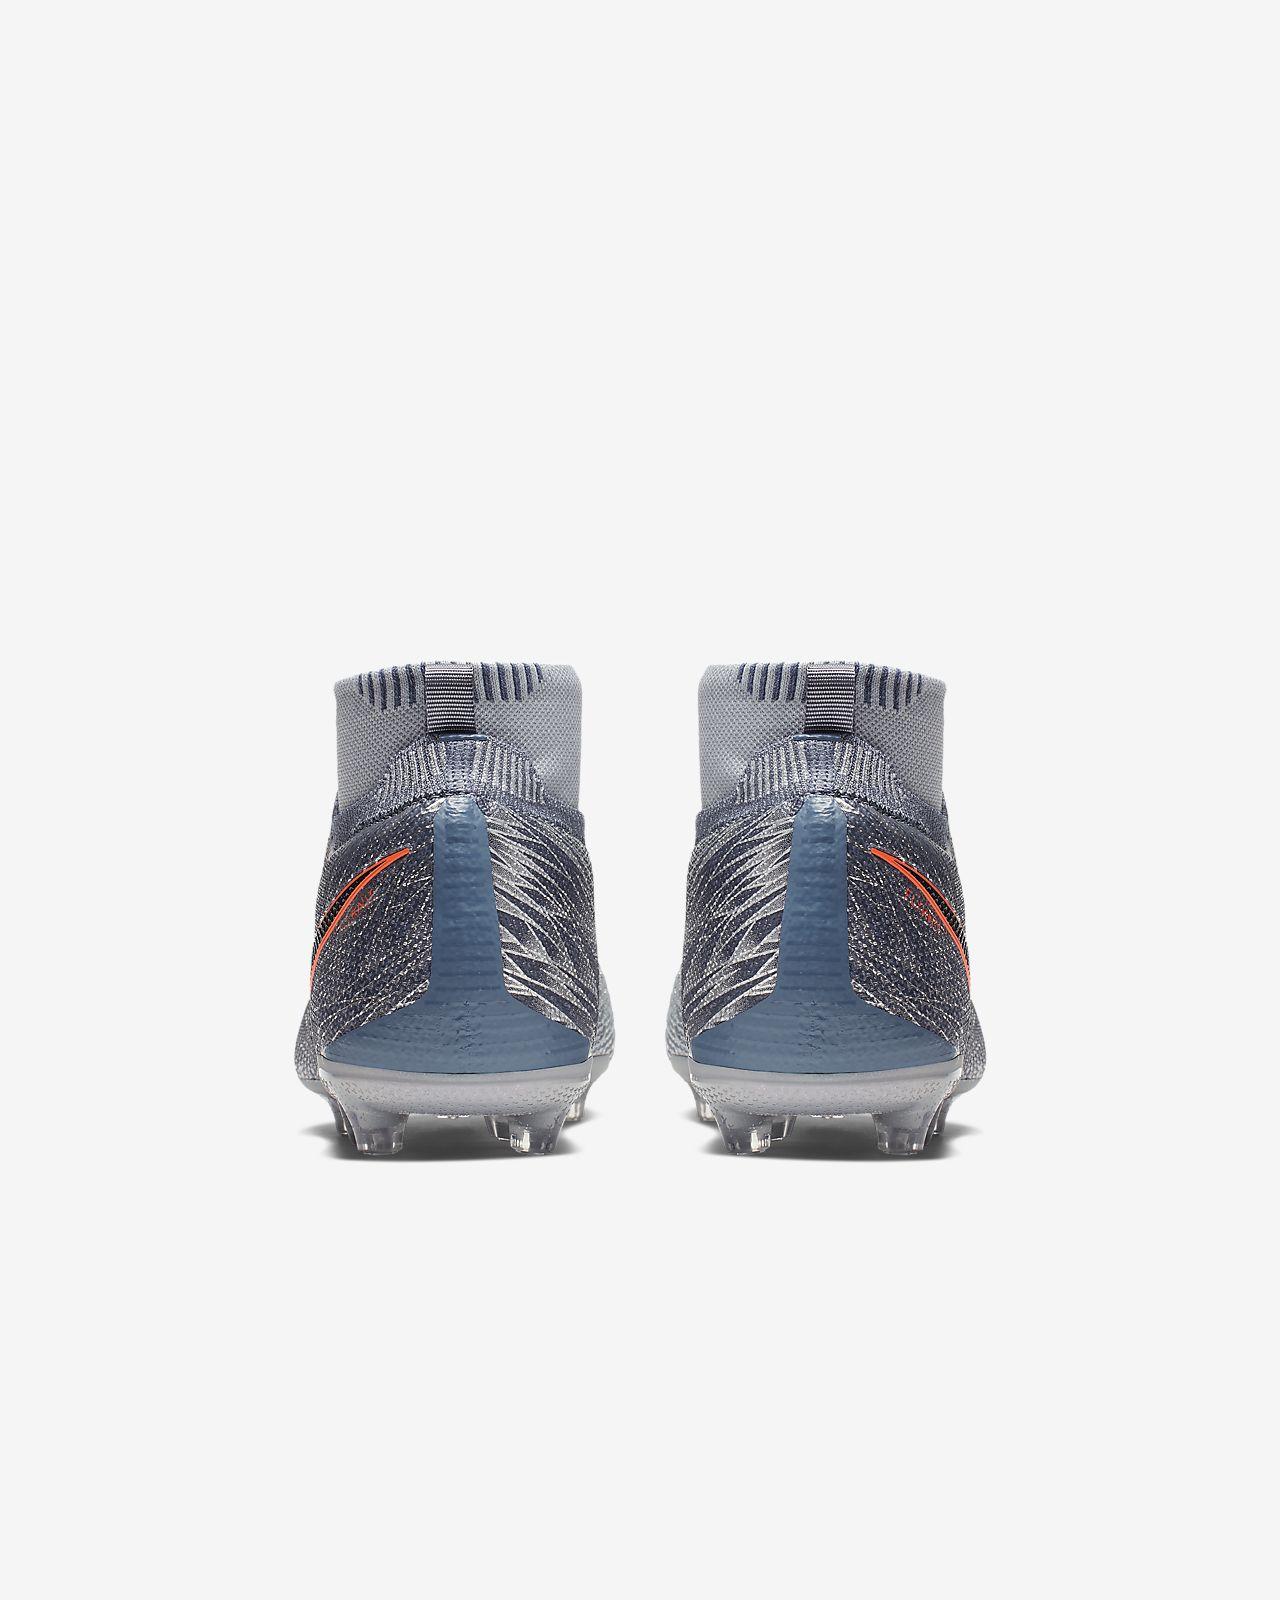 separation shoes facdc 2c940 ... Nike Jr. Phantom Vision Elite Dynamic Fit MG Big Kids  Multi-Ground  Soccer